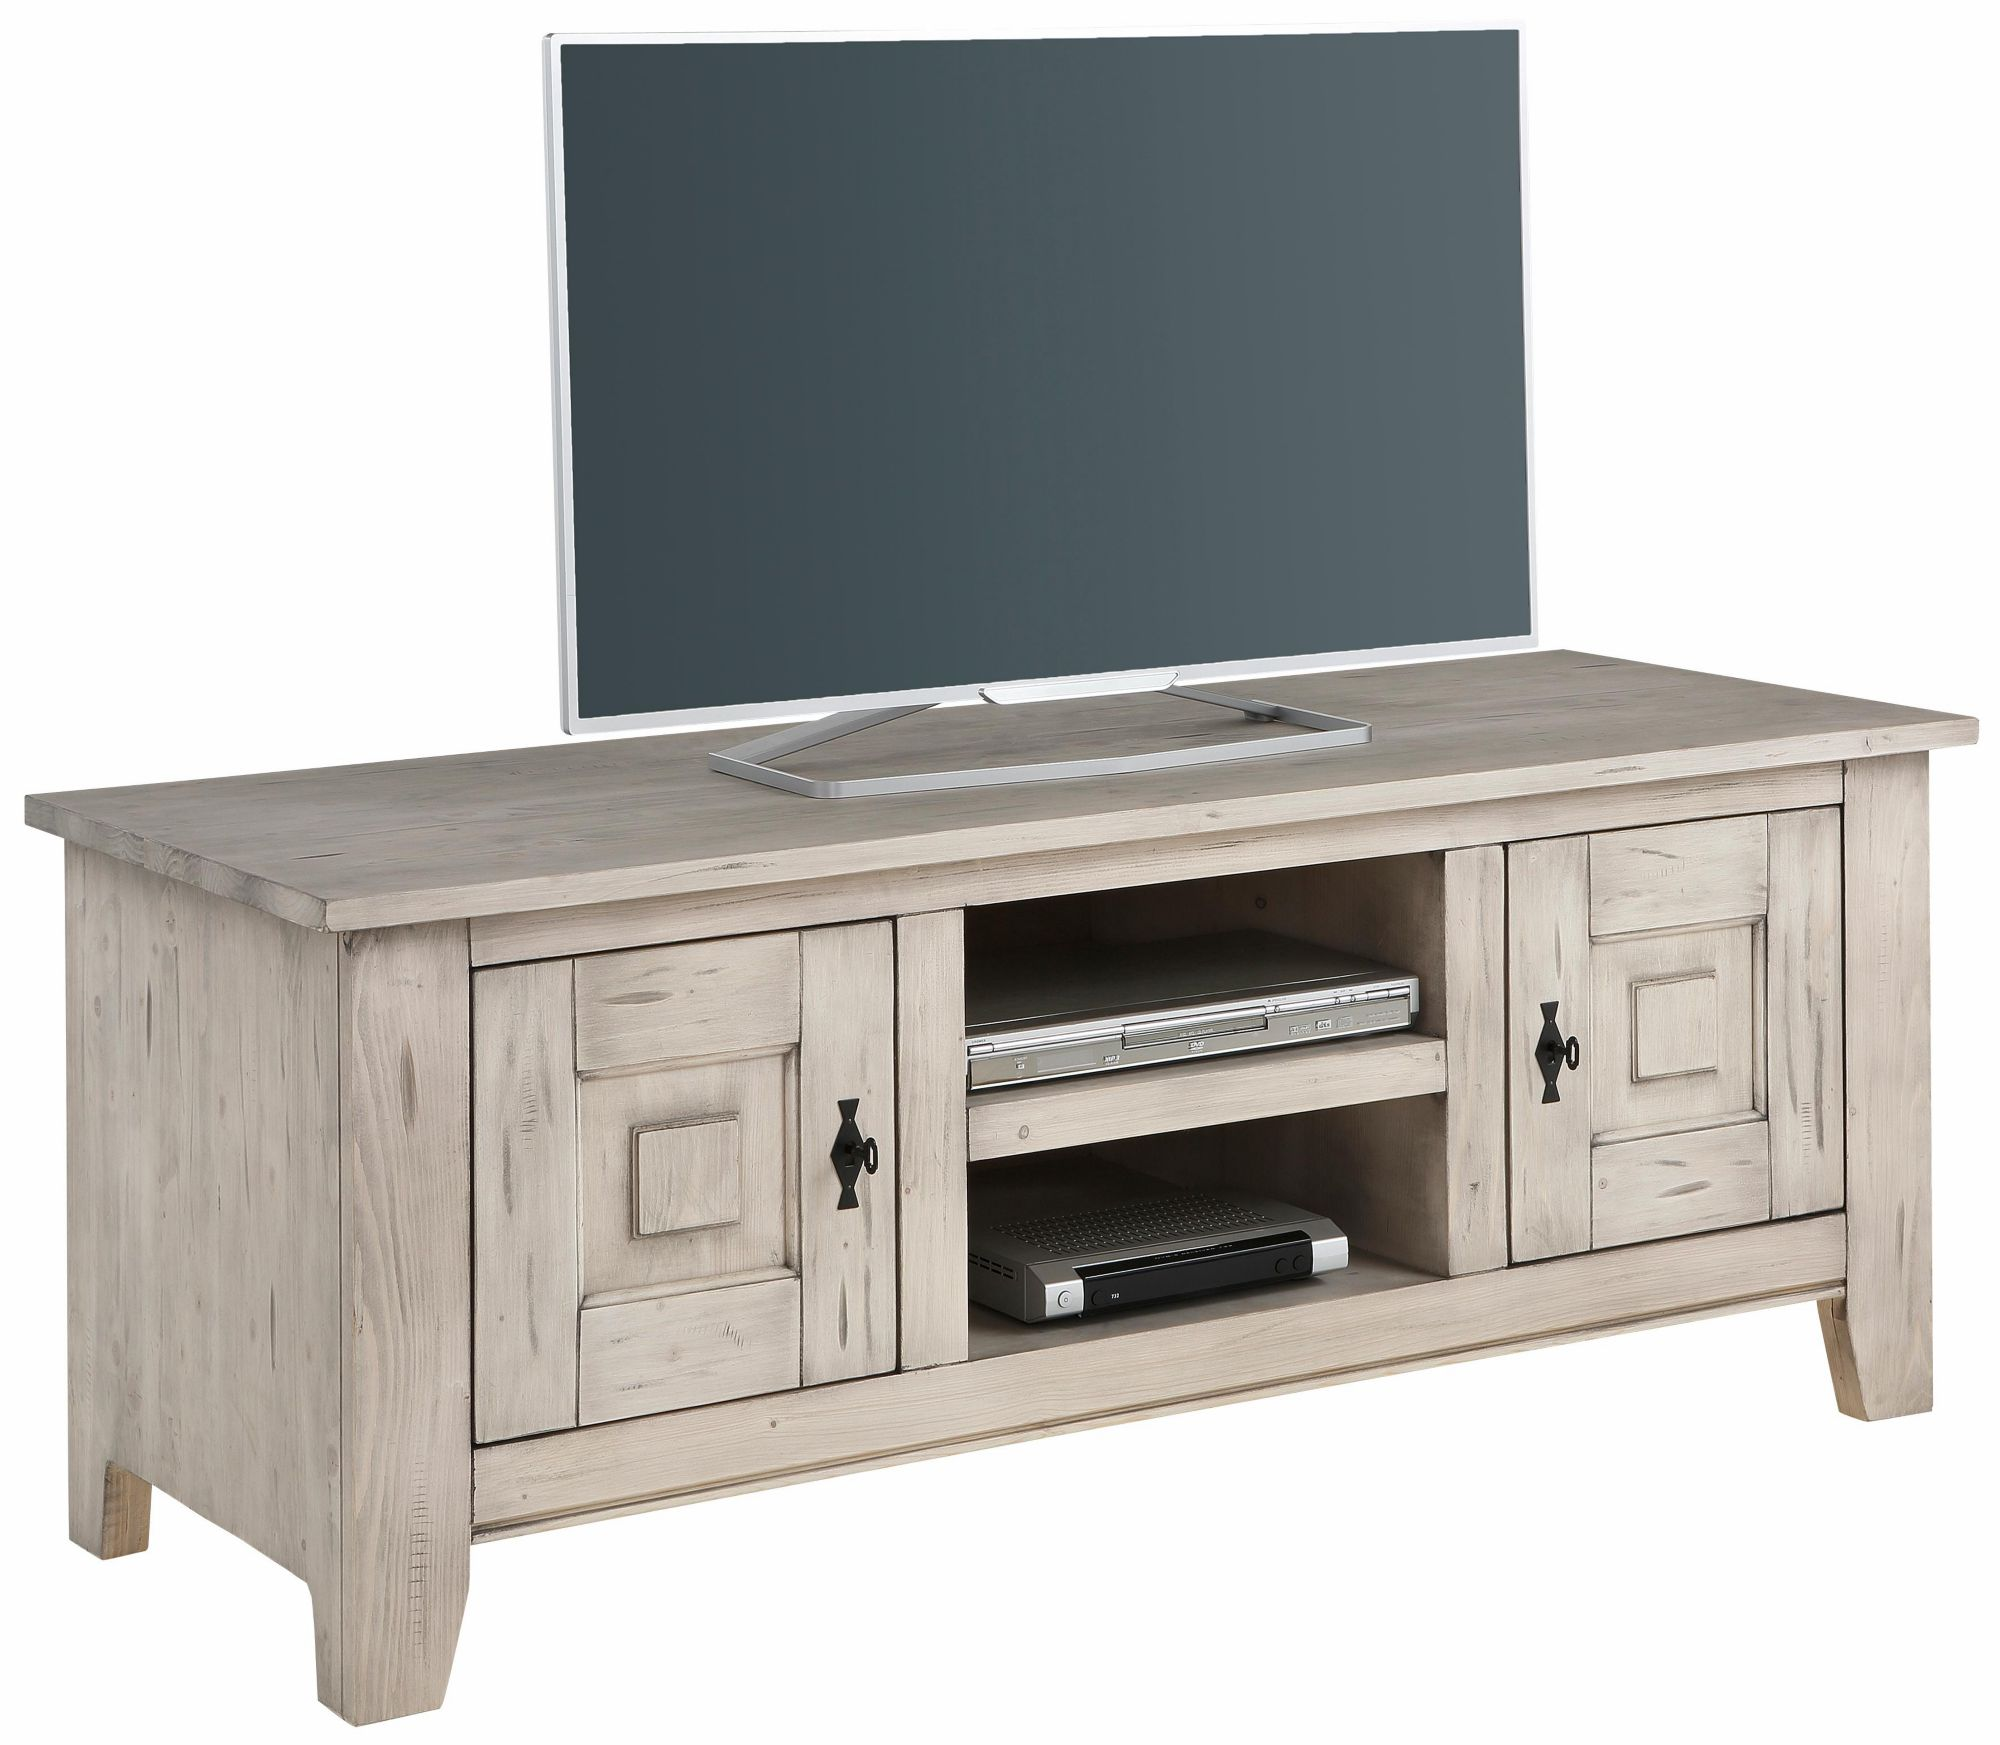 FAVORIT Favorit TV-Lowboard »Burgund«, Breite 150 cm